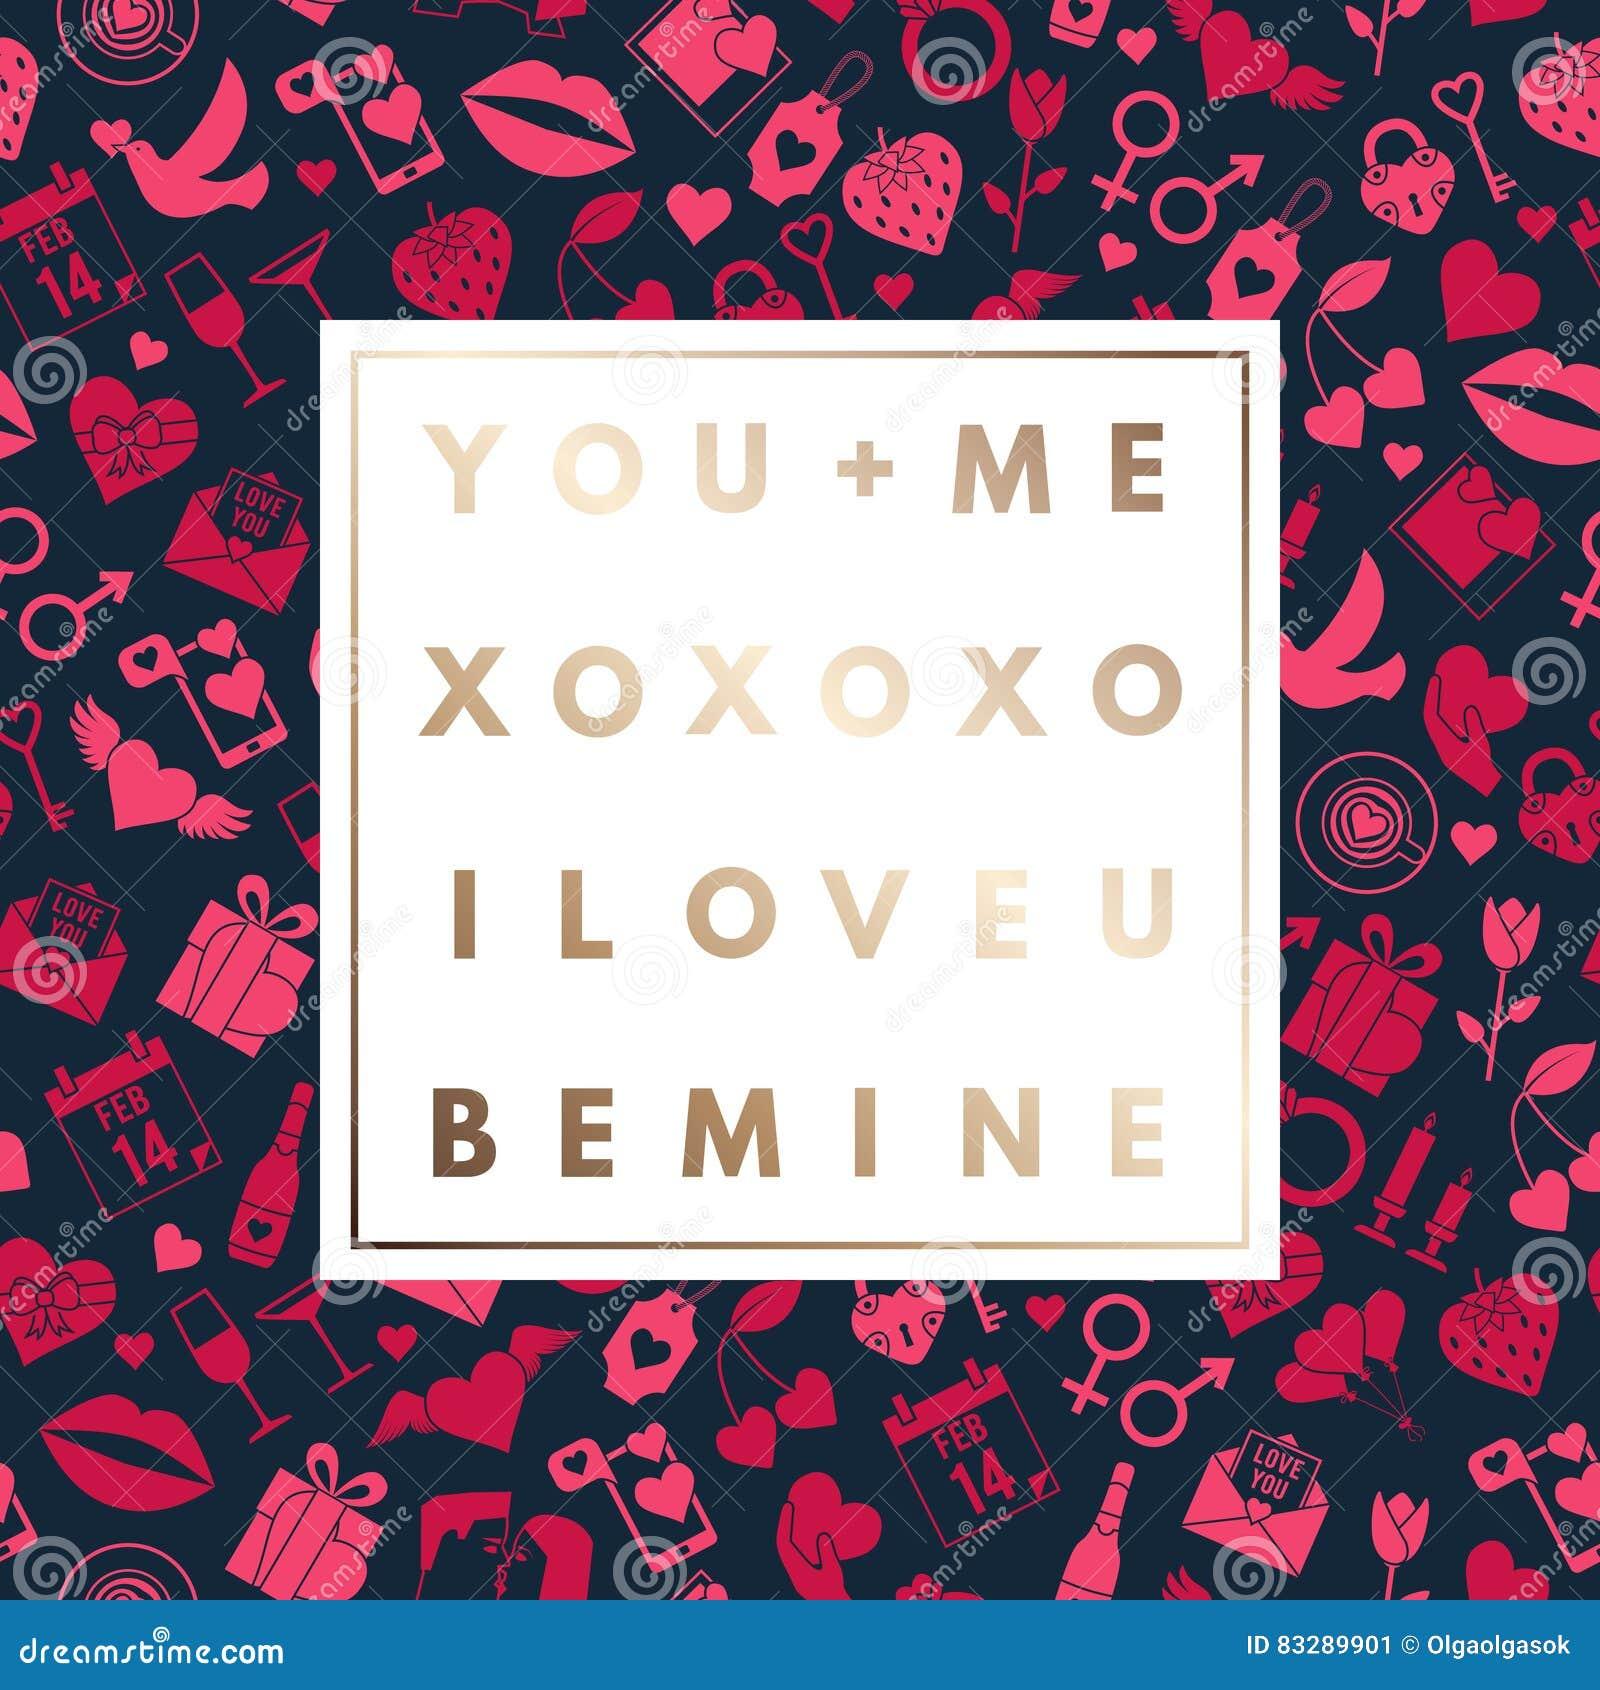 Romantic logo in frame stock vector. Illustration of love - 83289901